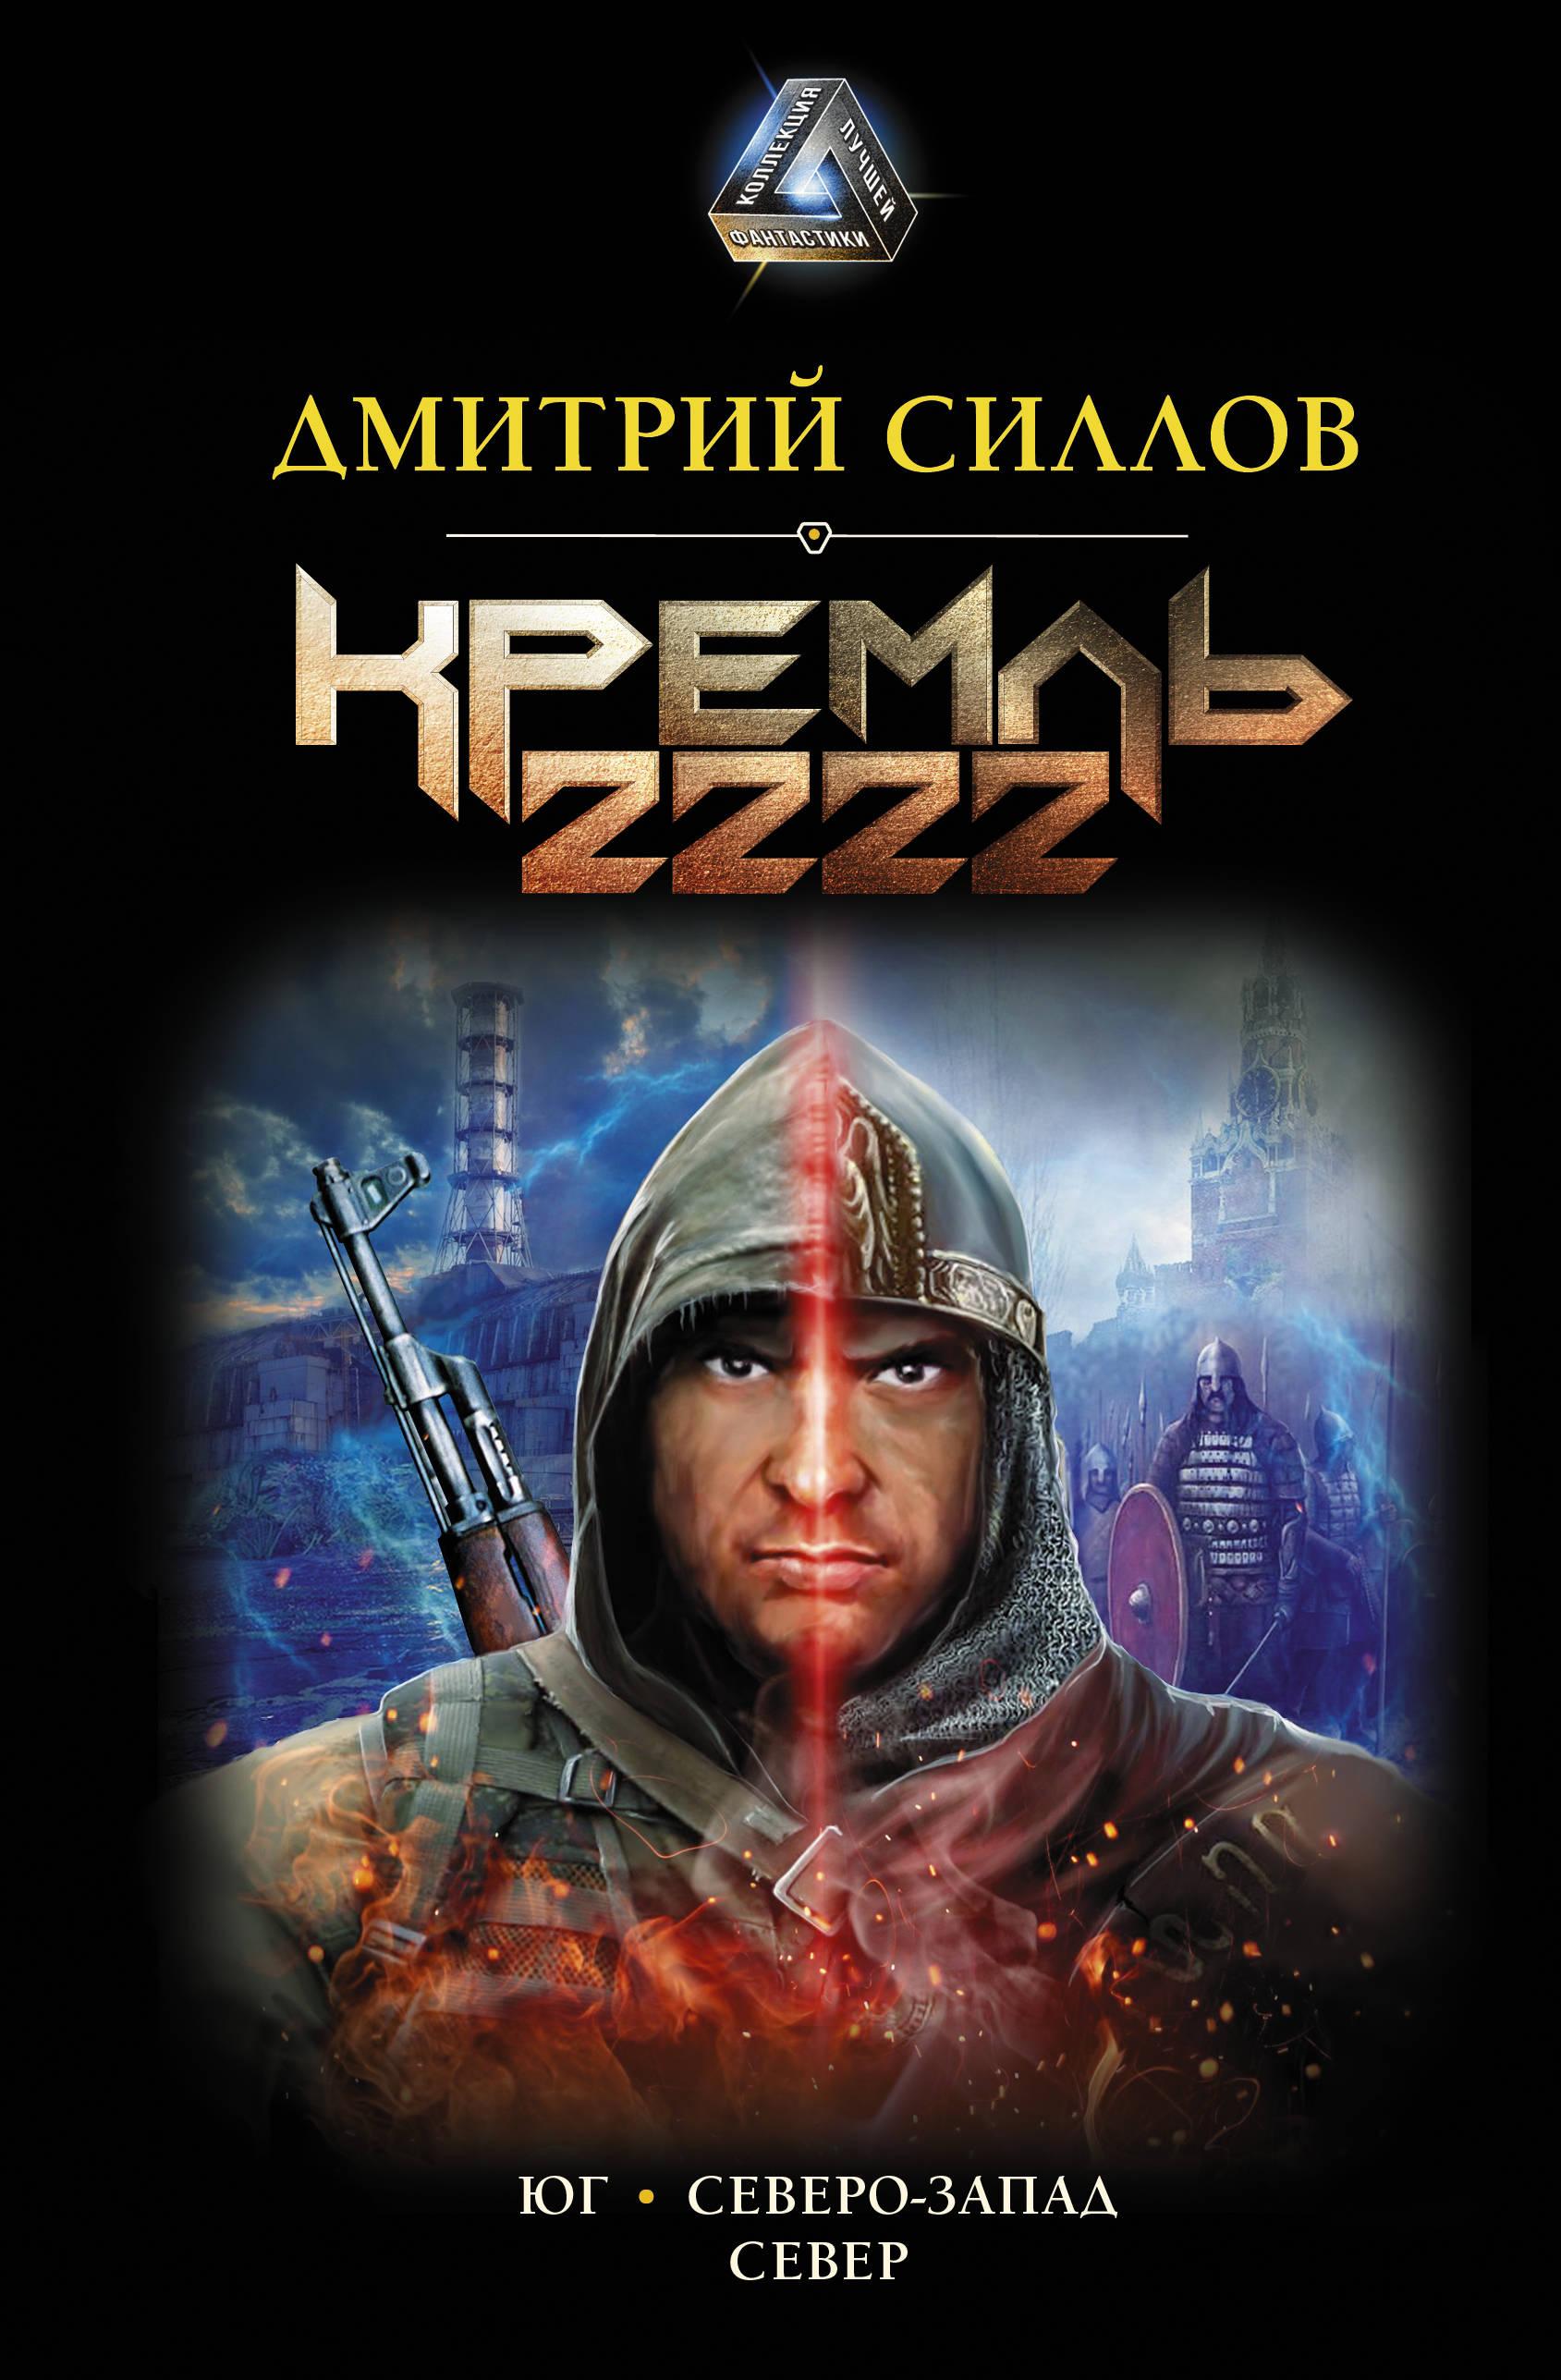 Дмитрий Силлов «Кремль 2222. Юг. Северо-Запад. Север»